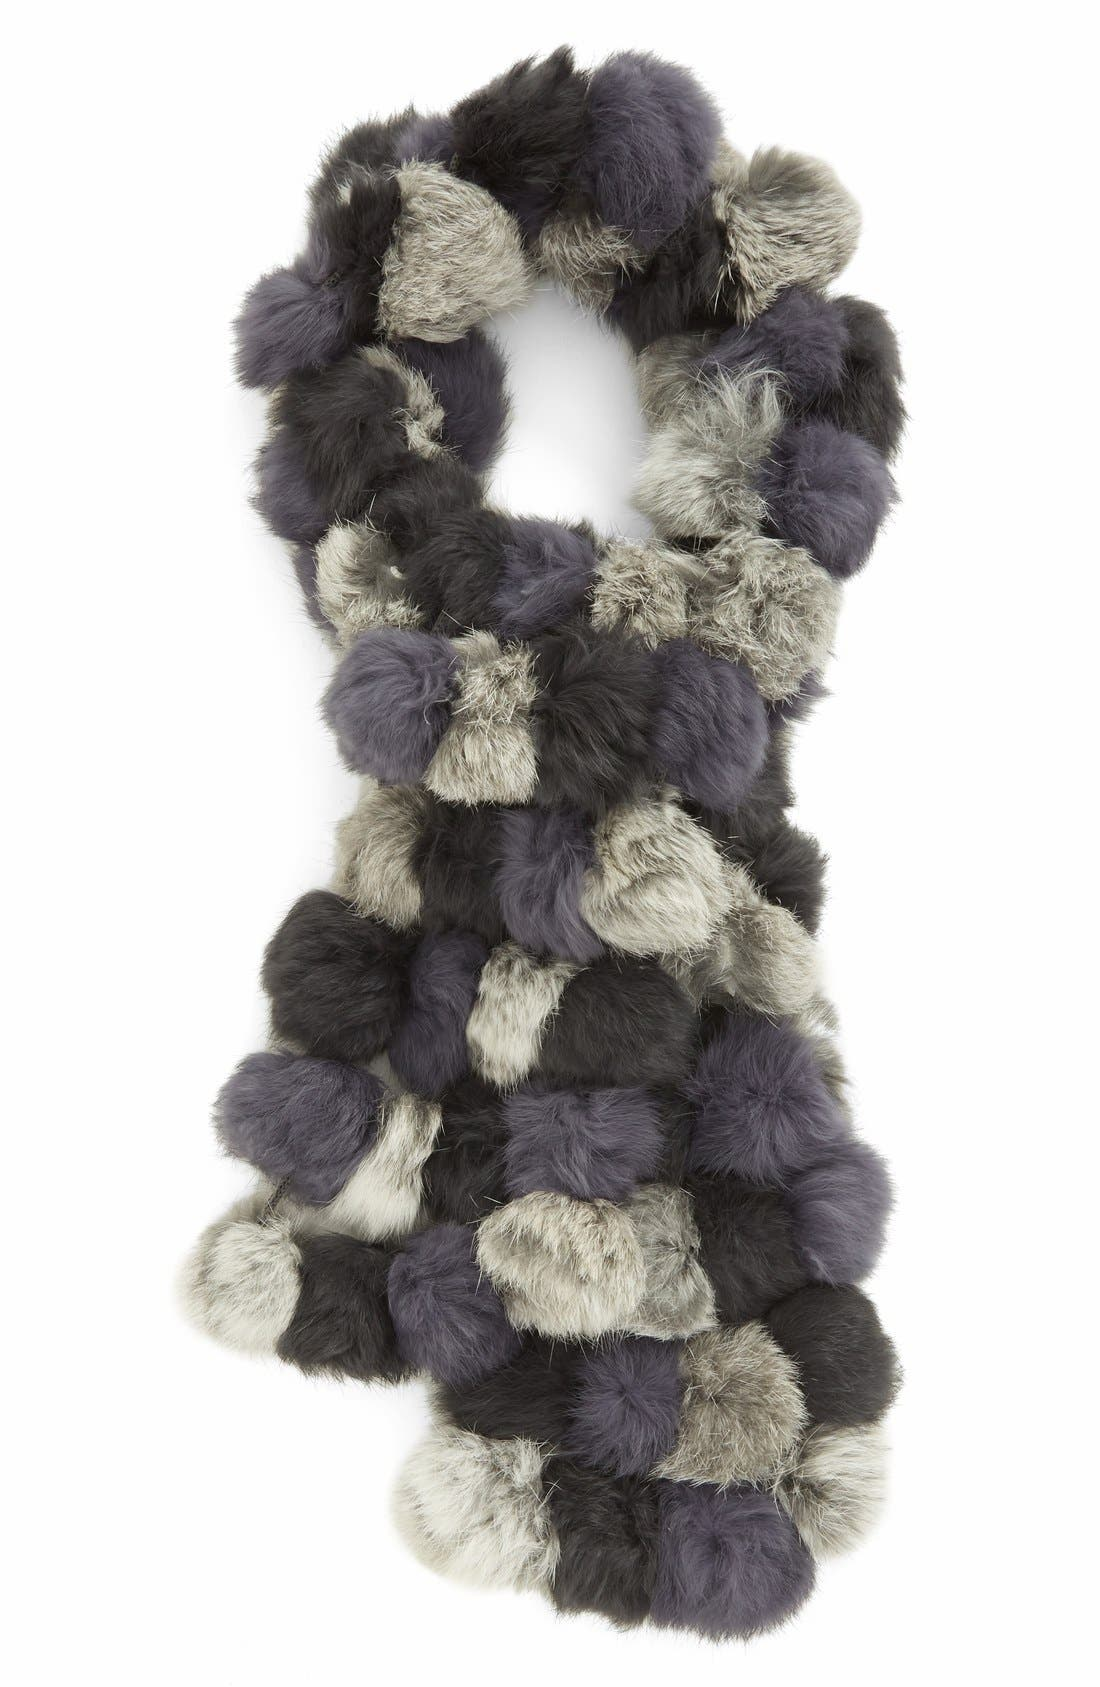 LA FIORENTINA,                             Genuine Rabbit Fur Scarf,                             Main thumbnail 1, color,                             BLACK/GREY